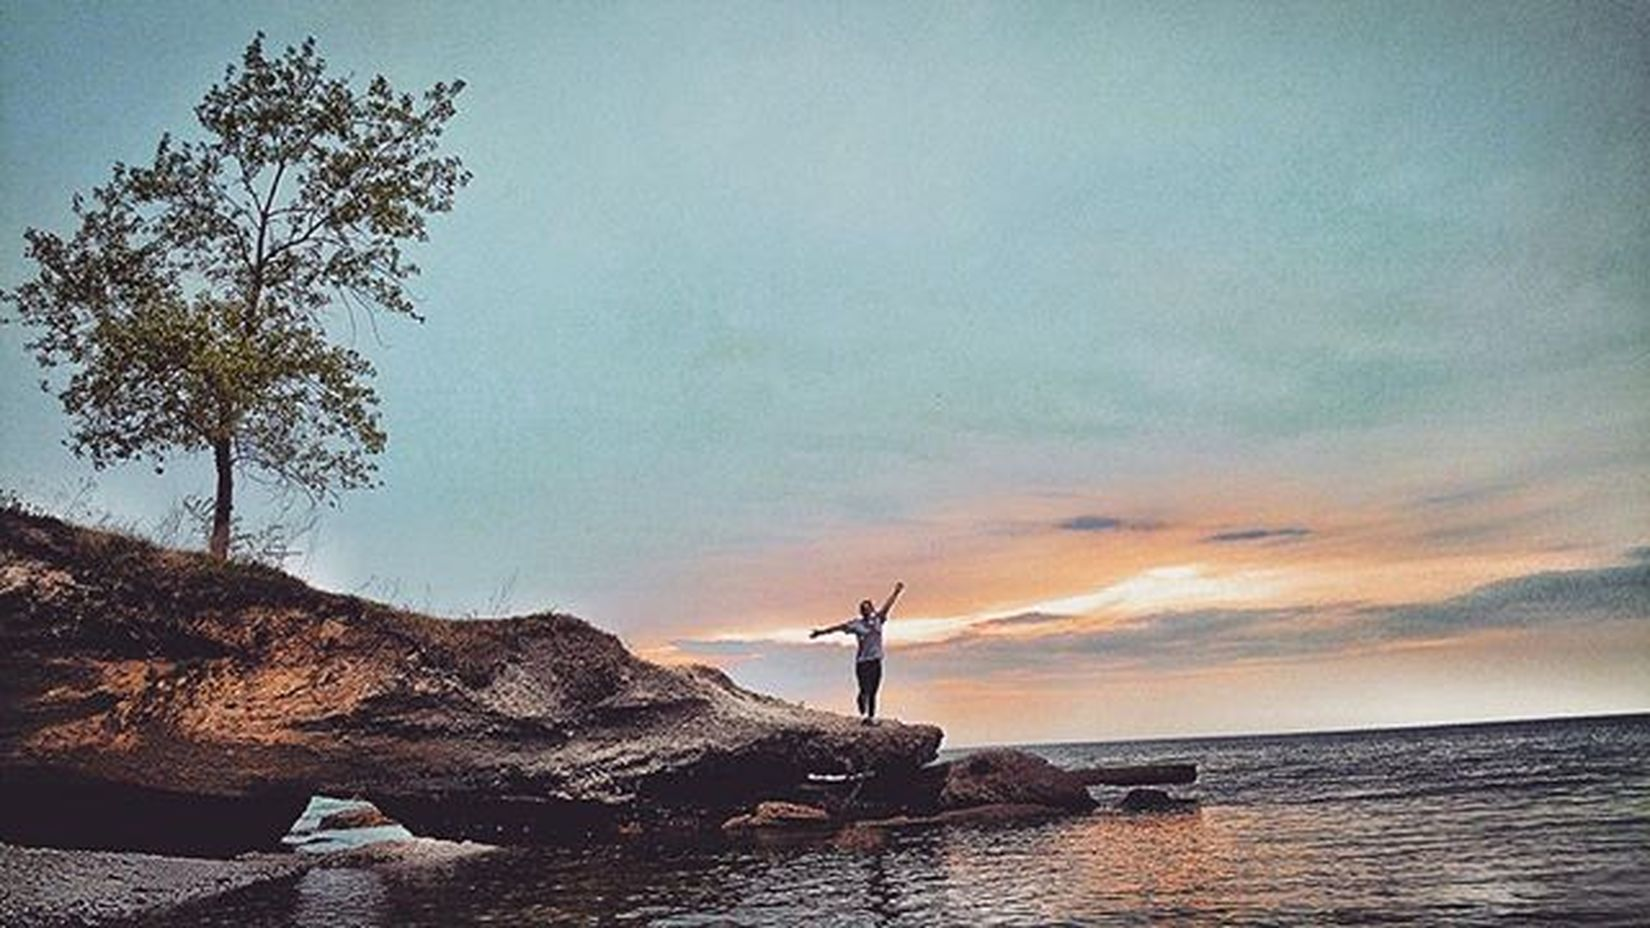 -HELLO!- Explore Rochesterny  Roctopshots Explorerochester NY Nature Vscocam Snapseed Ontario Water Color Clouds Leadingrelocal Ericjamesfrank Earth Iphone6plus Sky Skylovers Photooftheday Instagram Beach Sodus Soduspoint Rochesternewyork